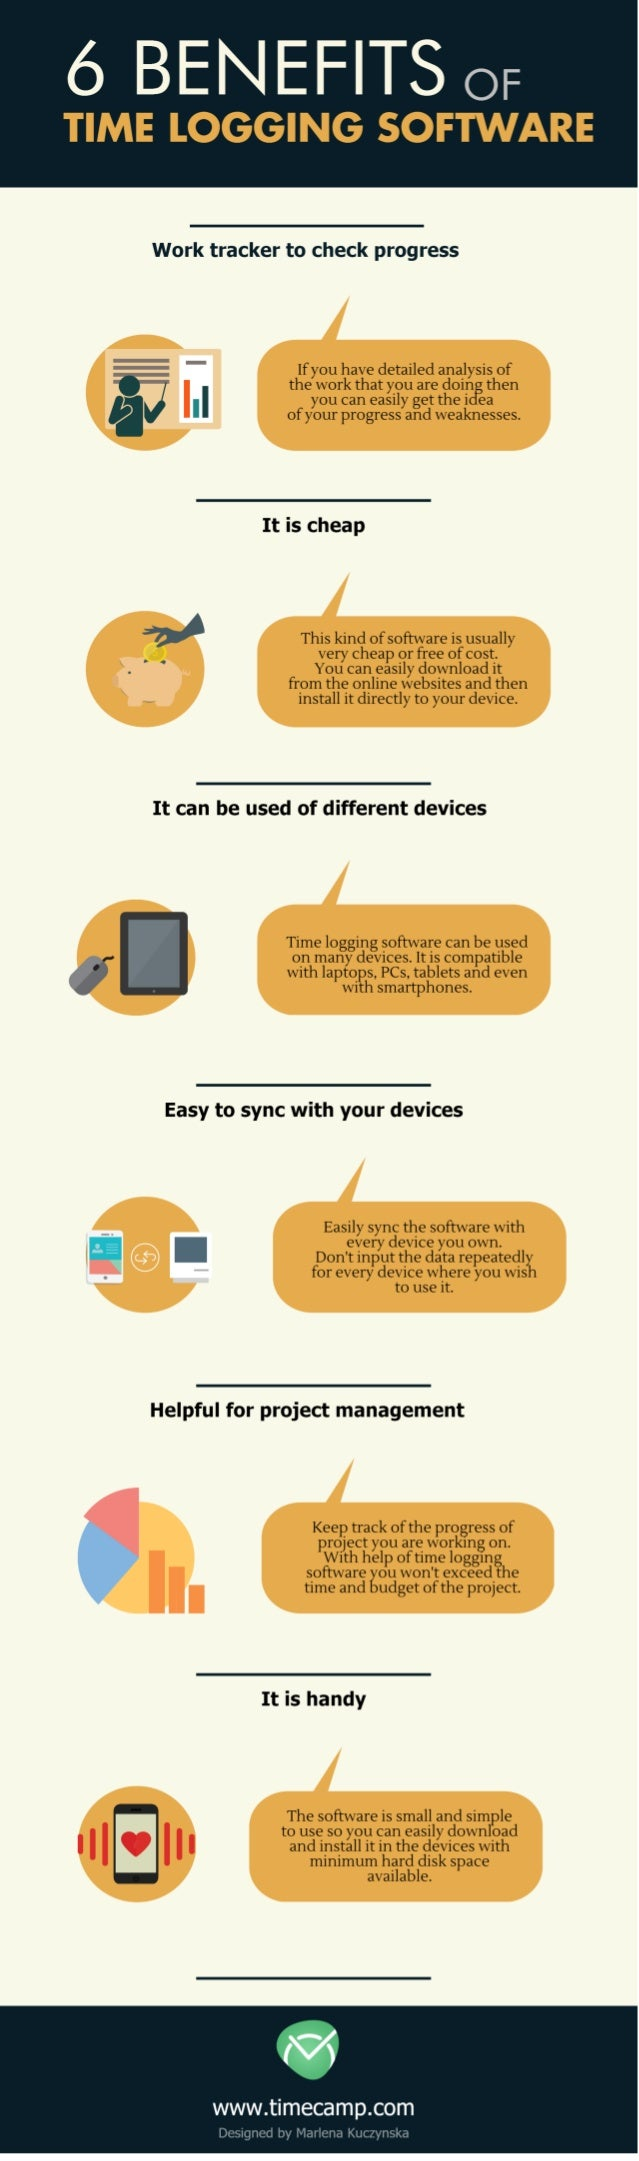 6 Benefits of Time Logging Software